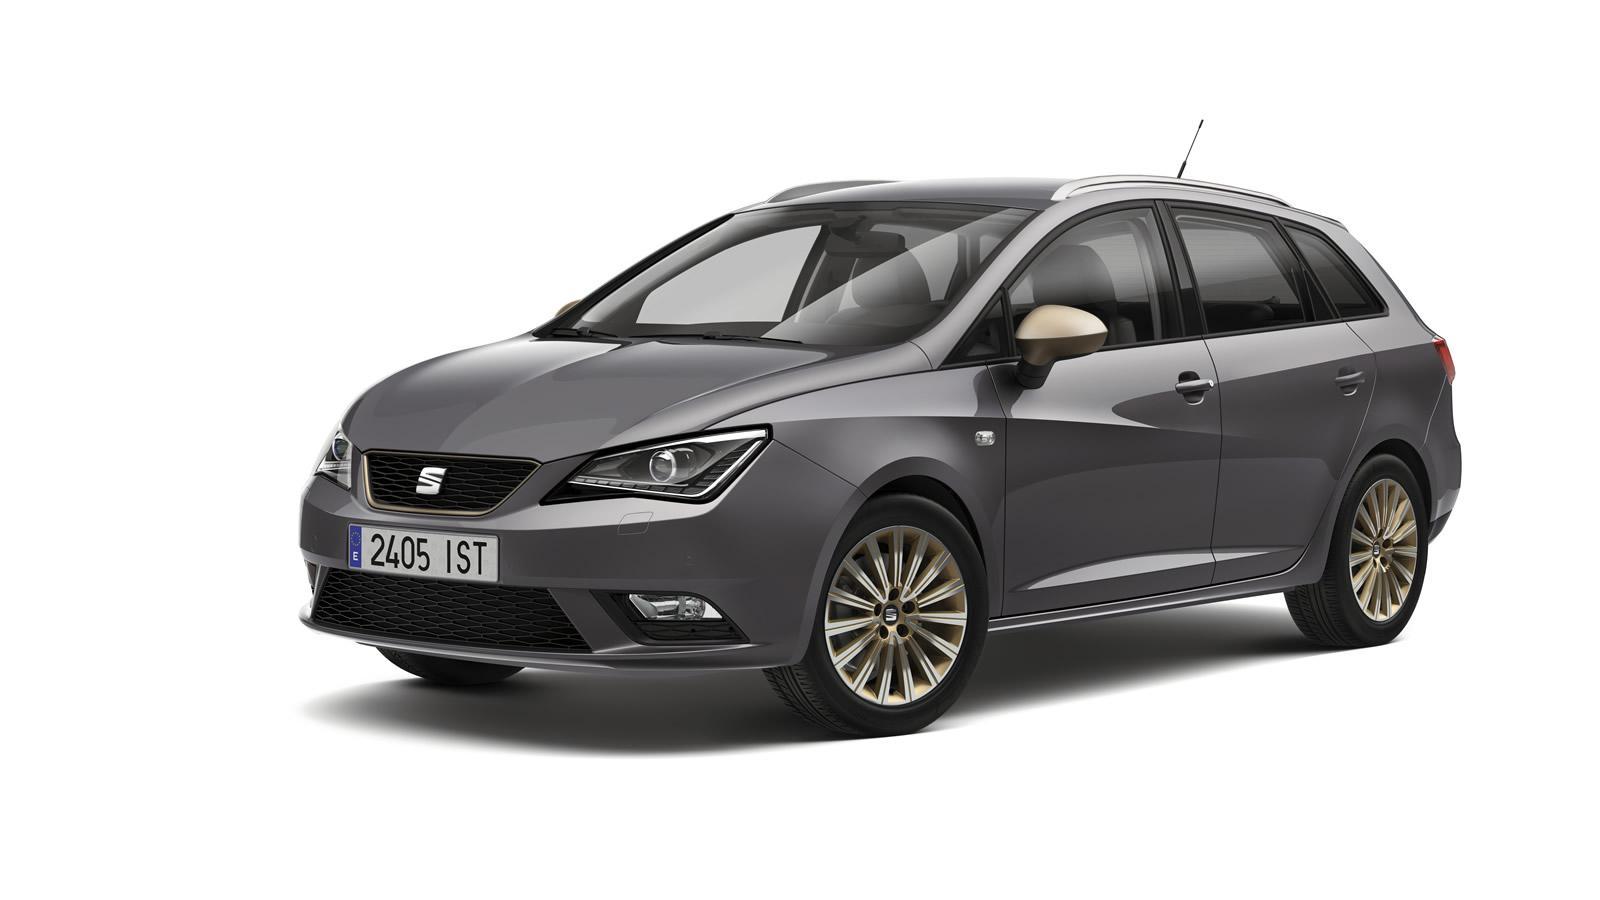 2015 SEAT Ibiza Facelift Gets Leon Interior Bits, Minor Cosmetic Tweaks